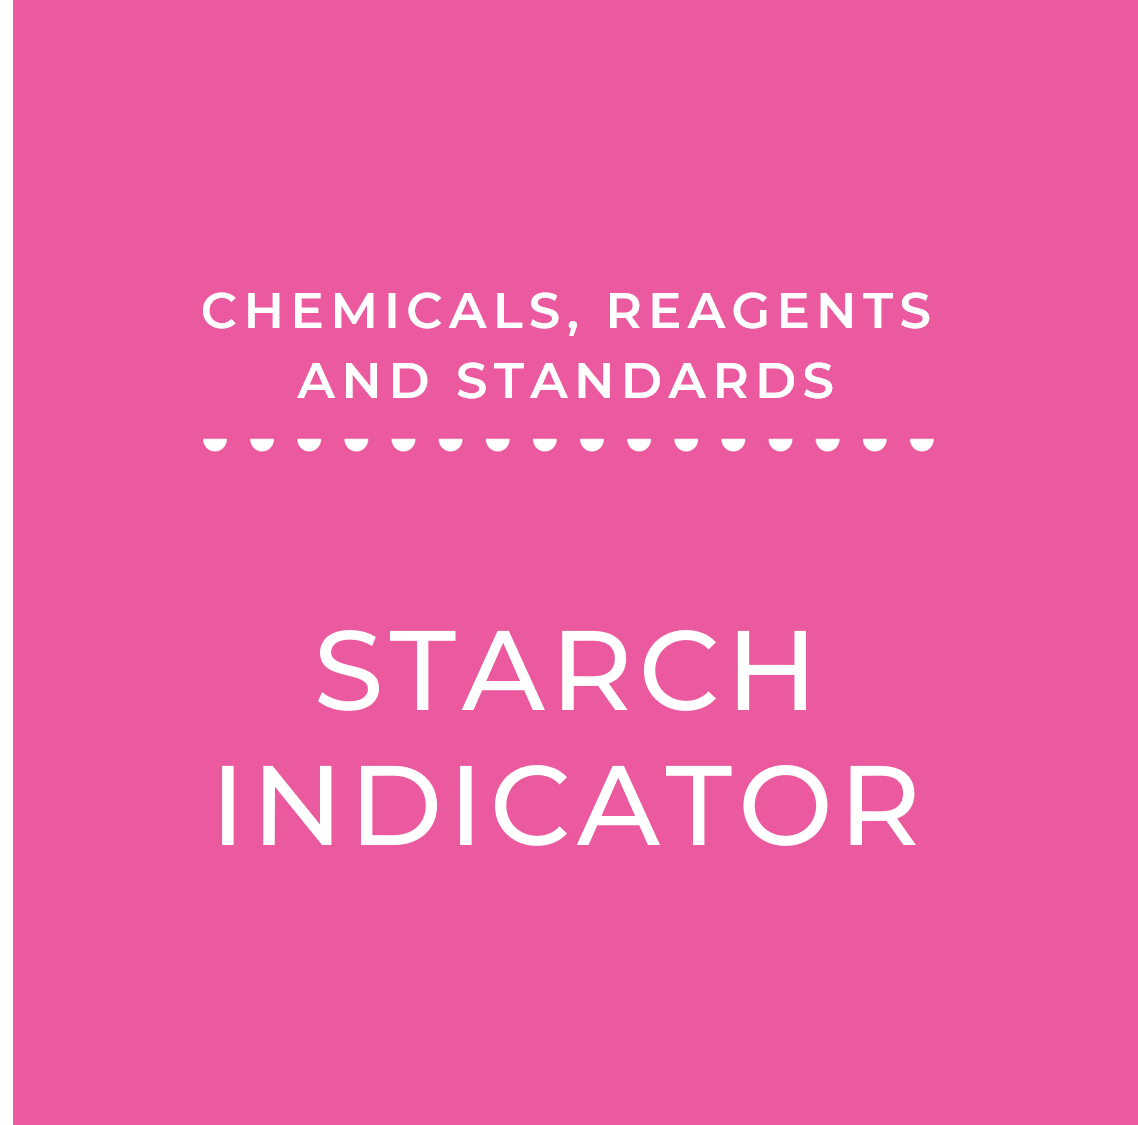 Starch Indicator